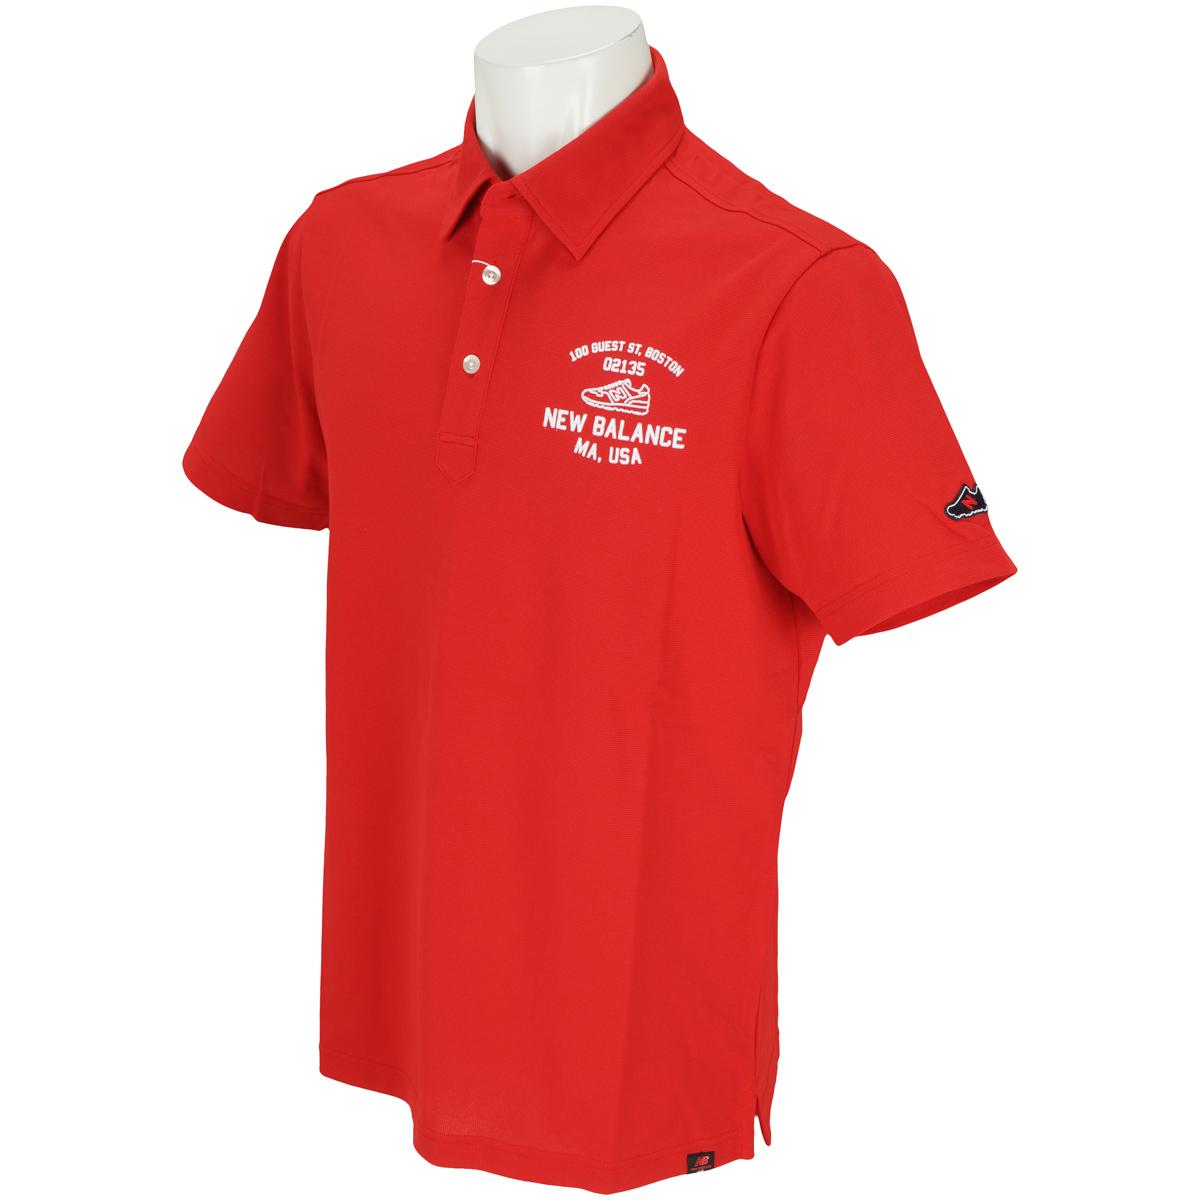 METRO タック鹿の子 半袖共衿ポロシャツ